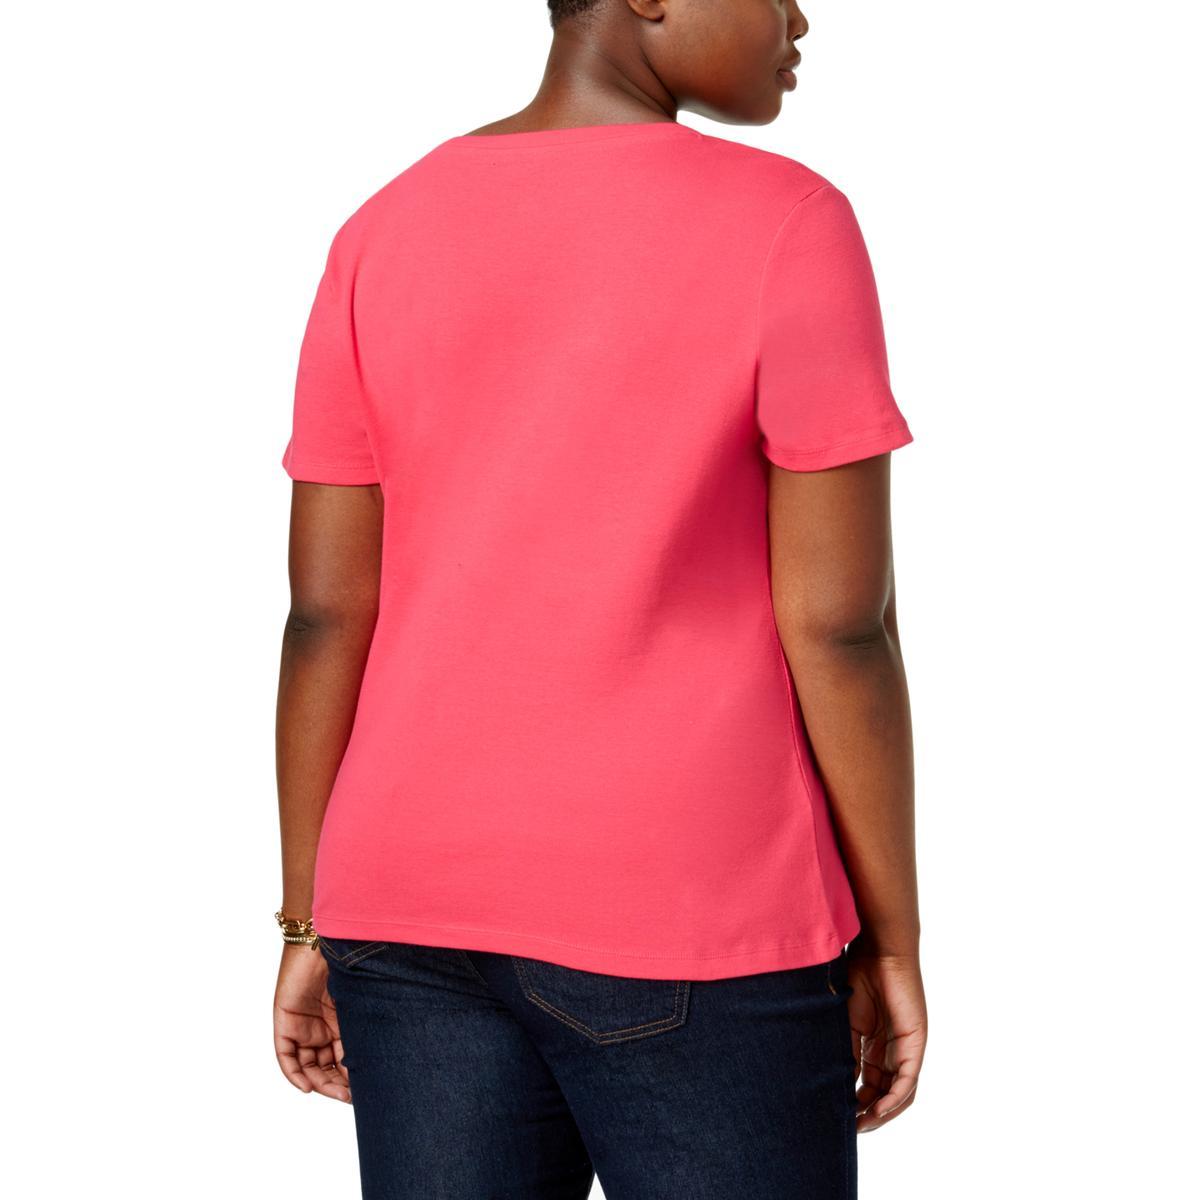 d933d7a7 Tommy Hilfiger Womens V-Neck Short Sleeves Casual T-Shirt Top Plus BHFO  0966 Dames: kleding